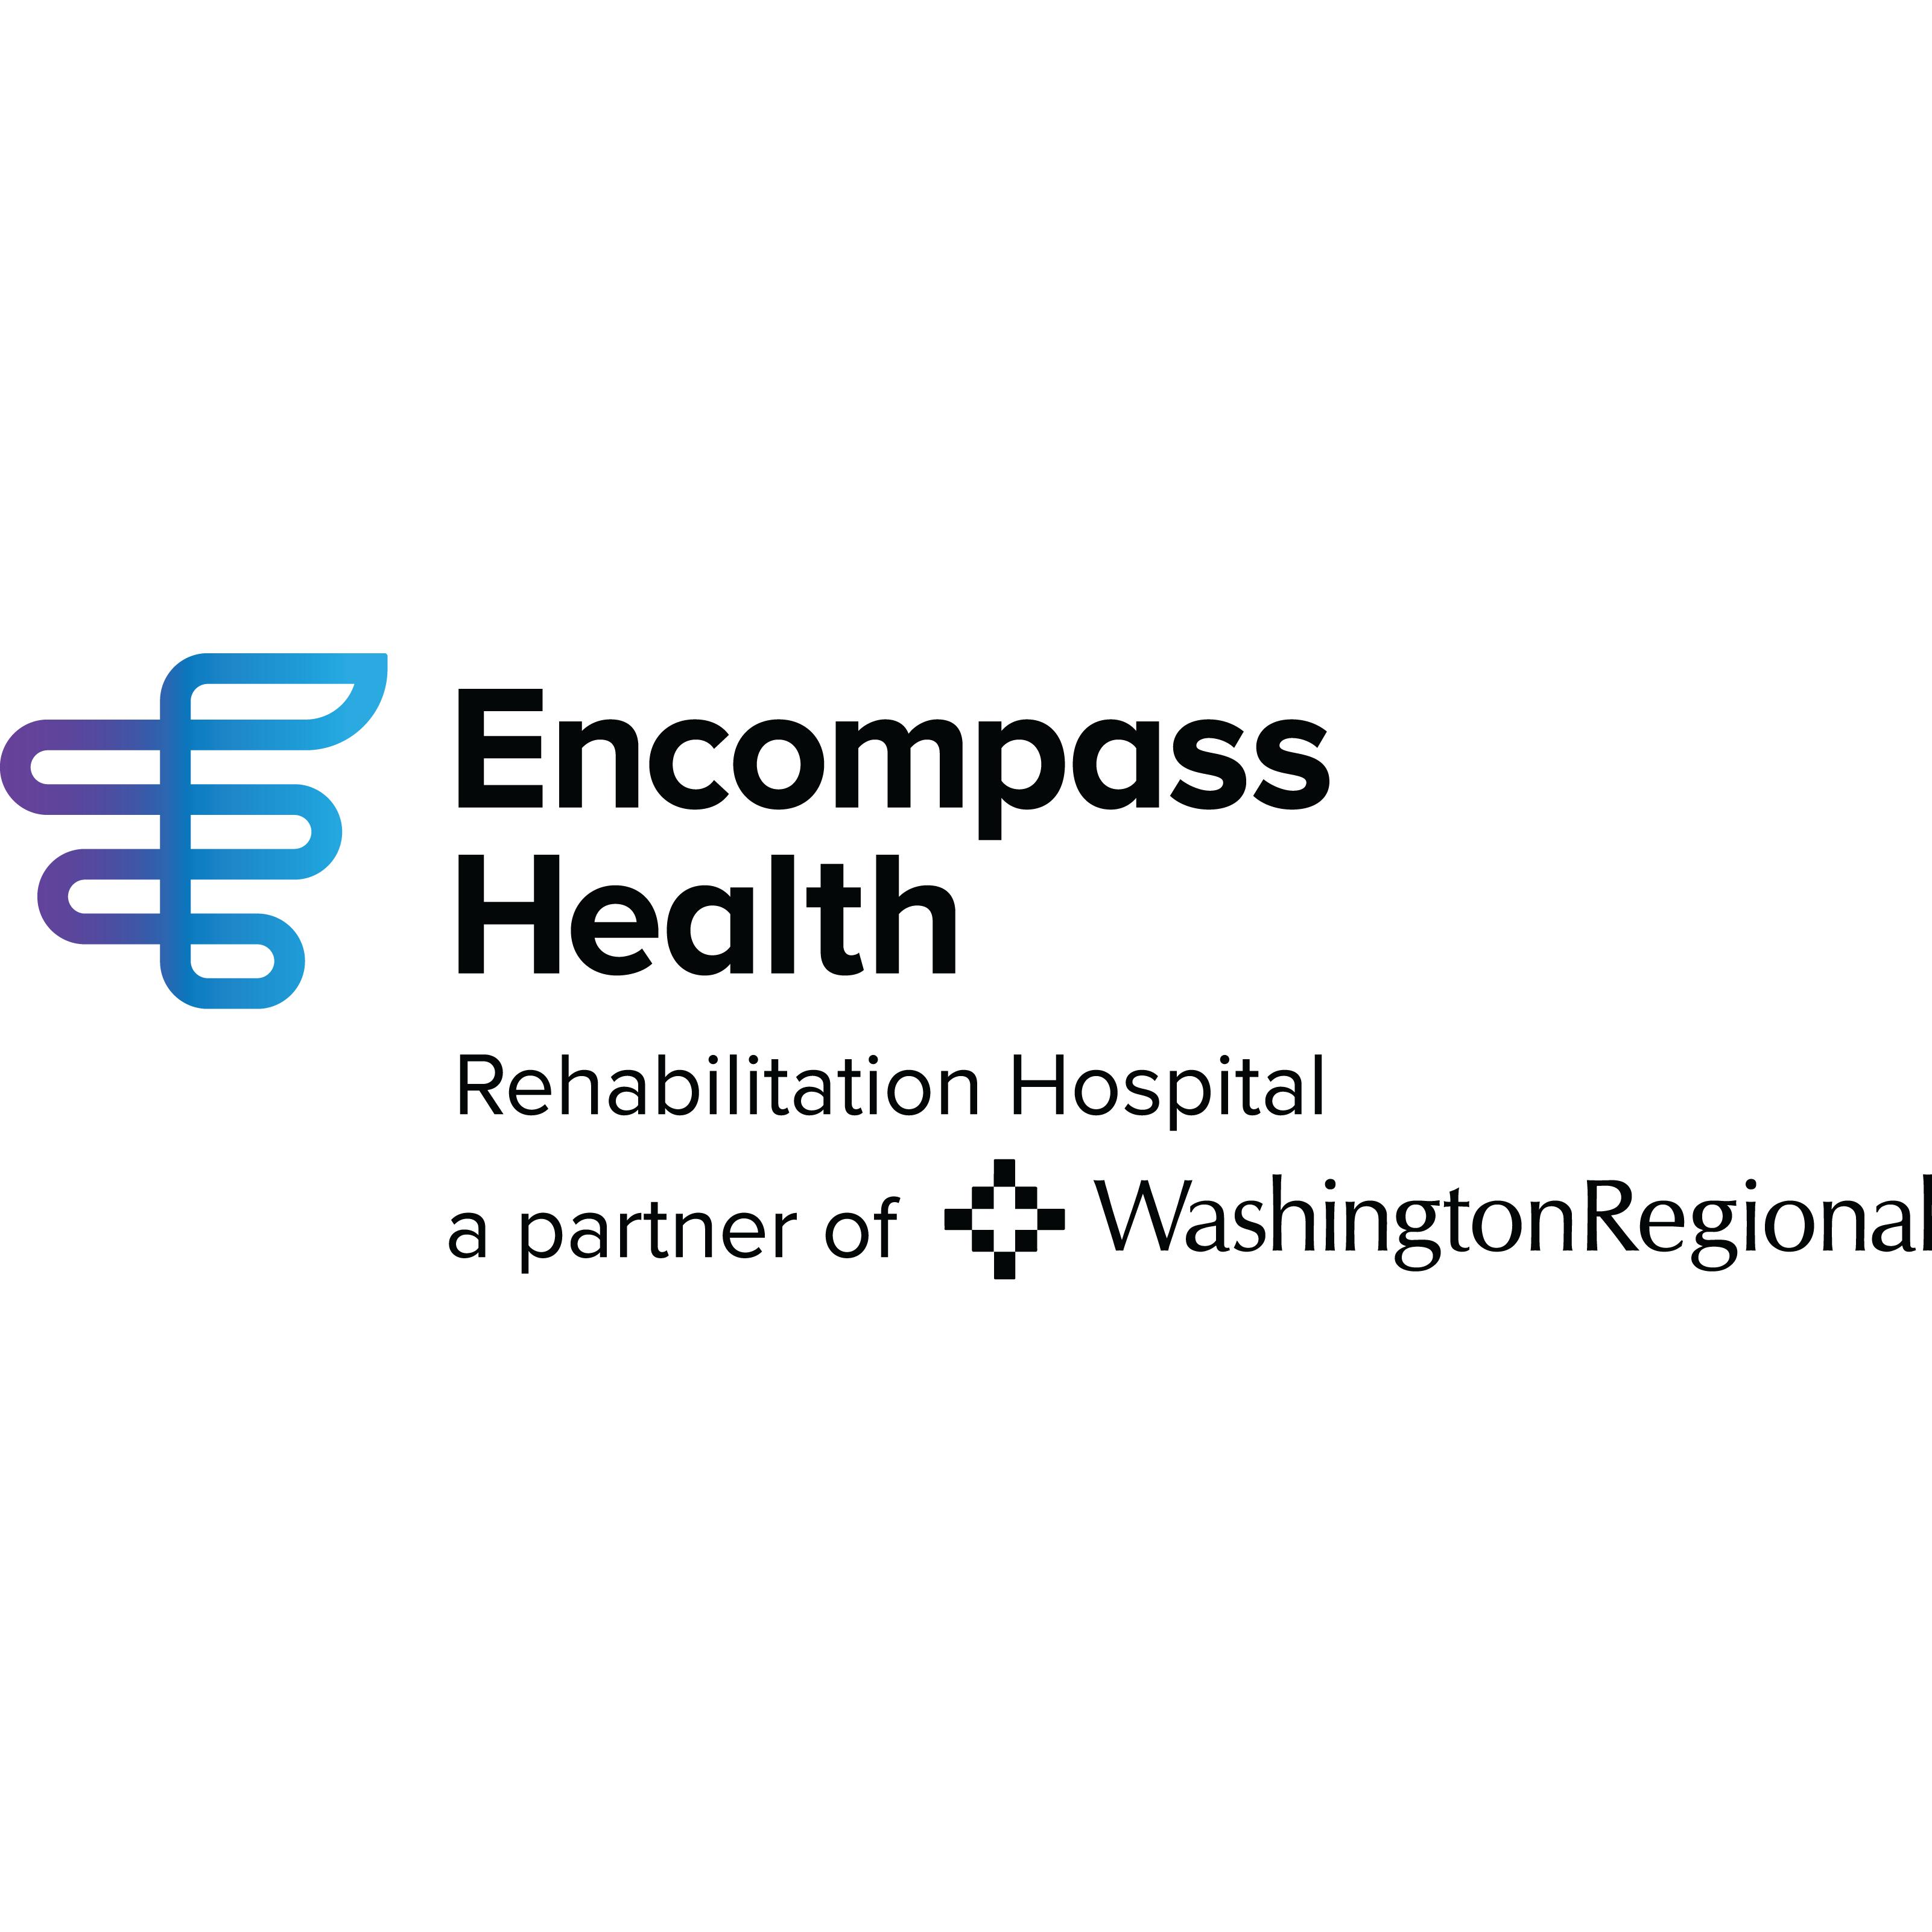 Encompass Health Rehabilitation Hospital, a partner of Washington Regional